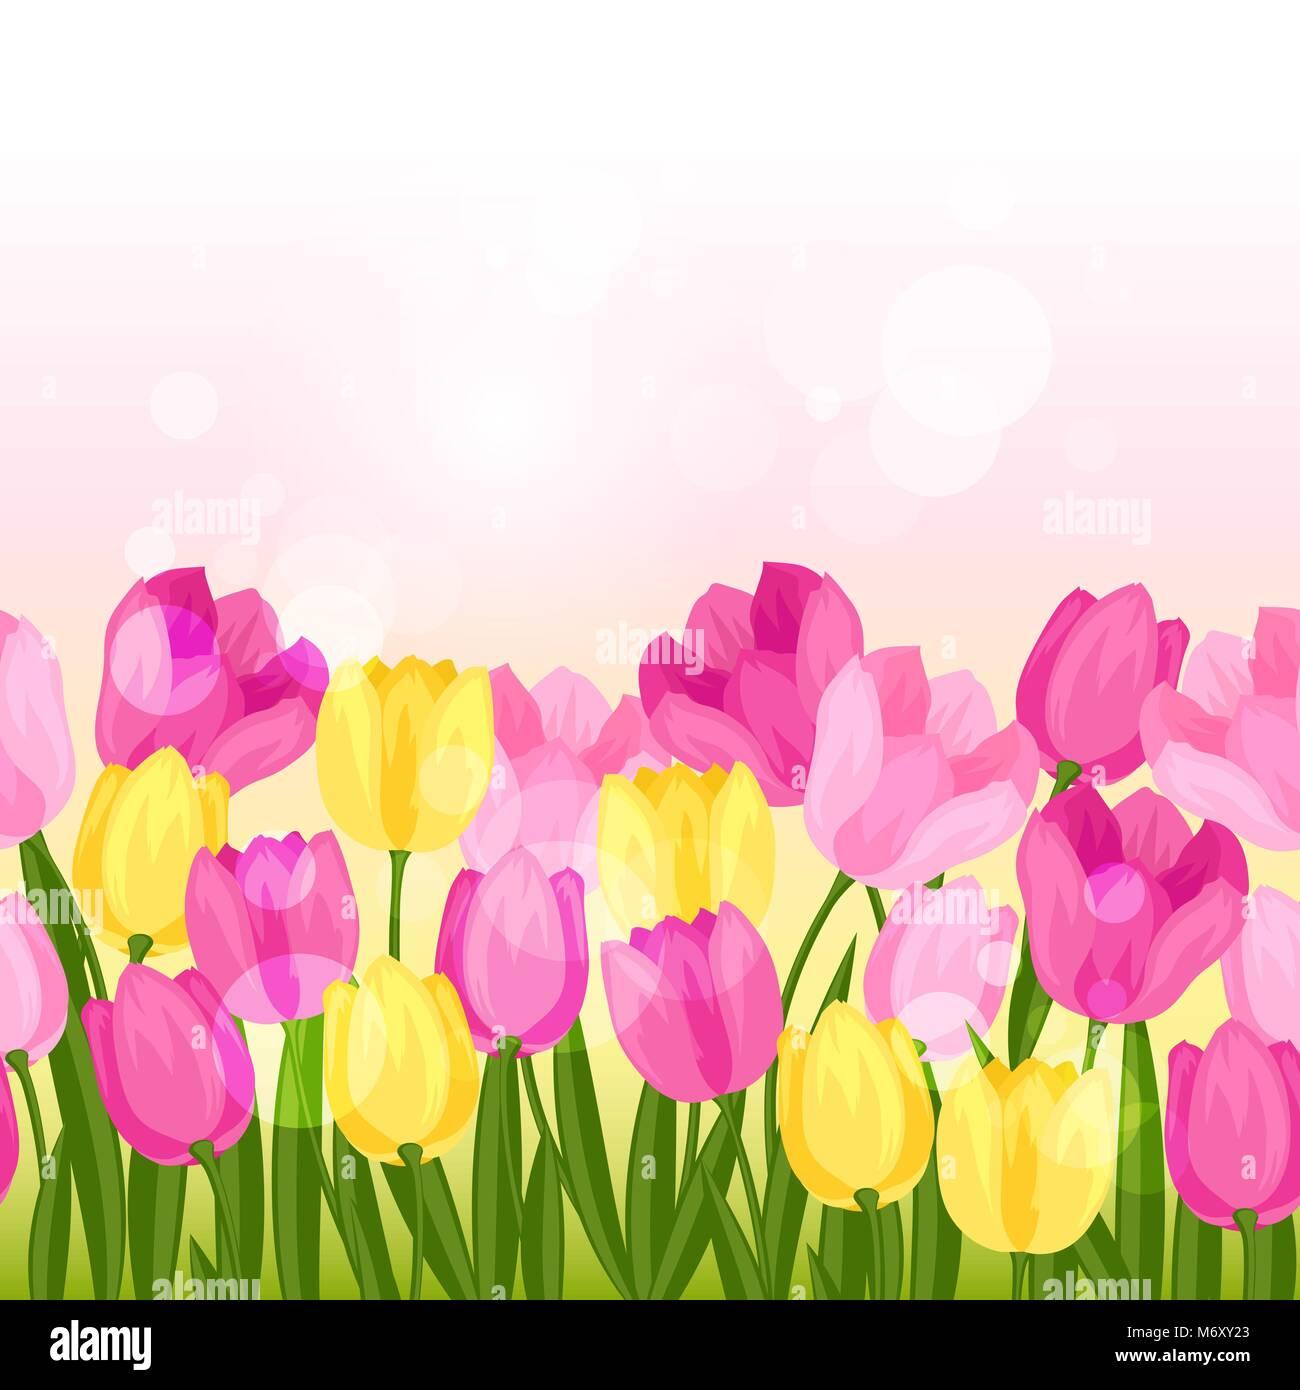 Spring flowers tulips seamless pattern horizontal border stock spring flowers tulips seamless pattern horizontal border mightylinksfo